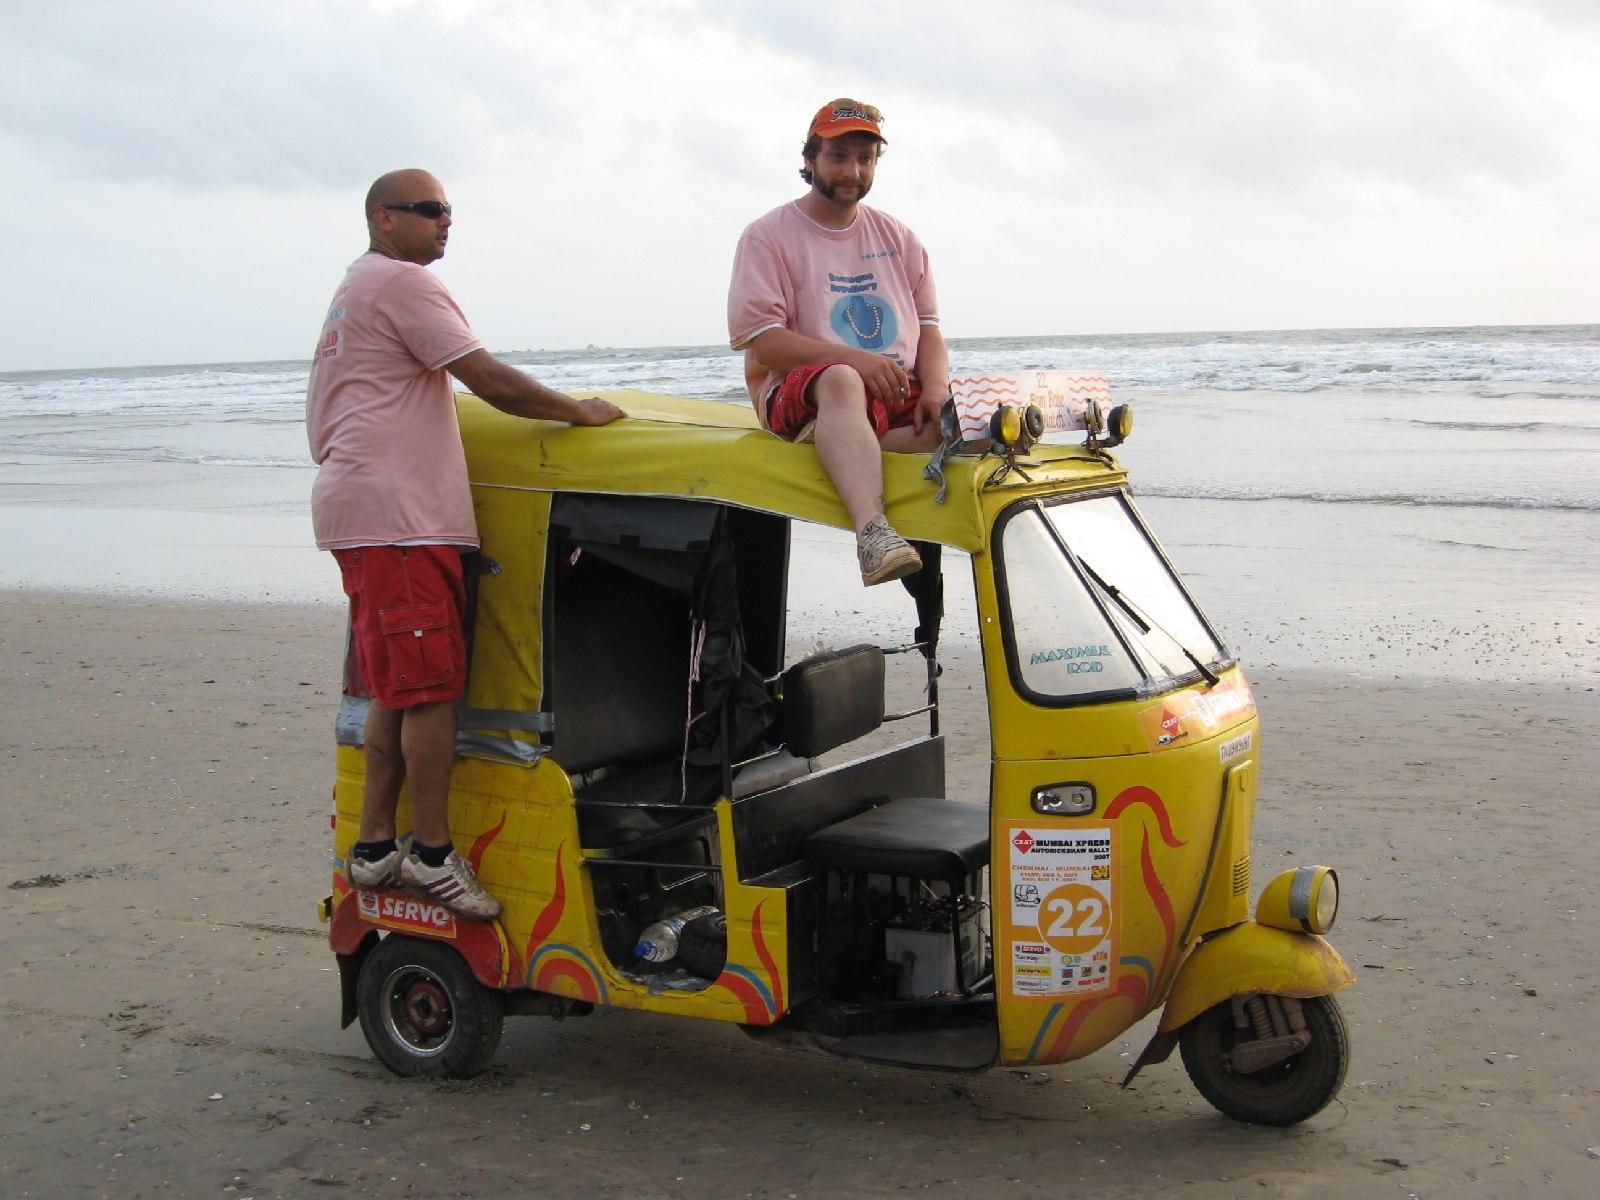 The Rickshaw Challenge - A Three Wheeled Race Across India